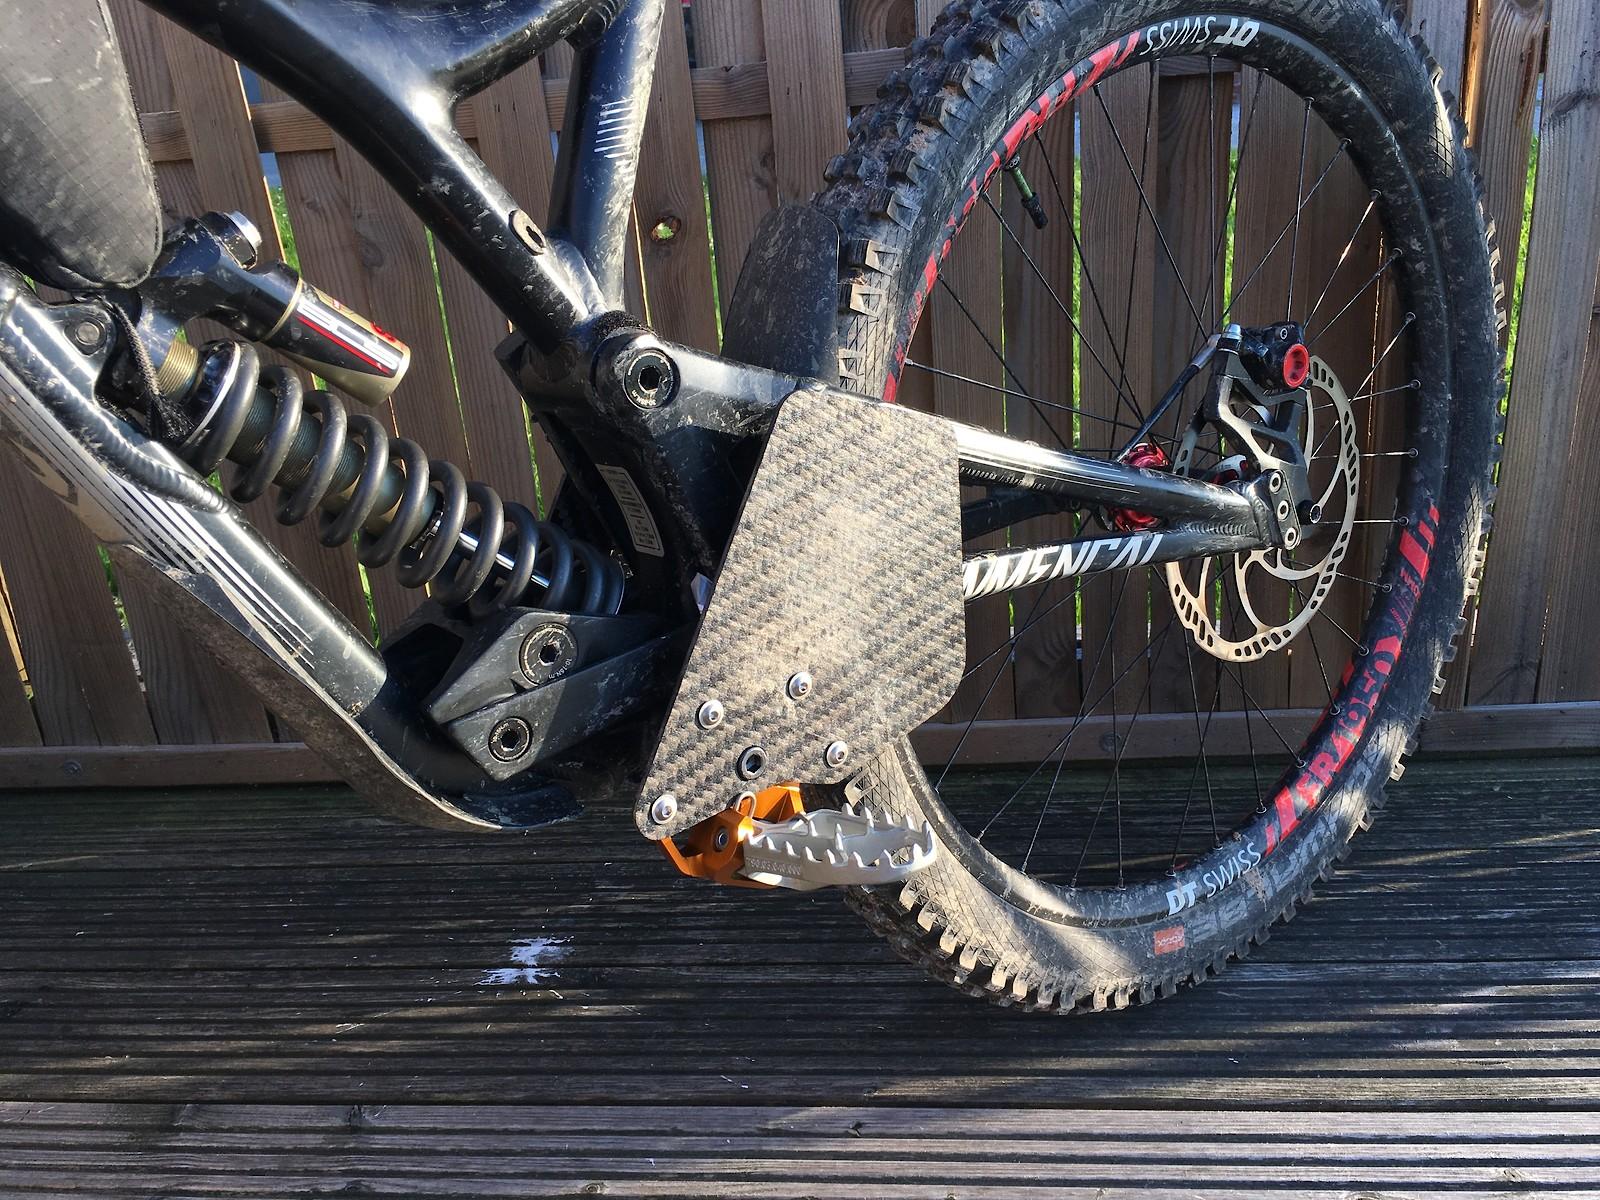 V2 Footrest Setup wider, lighter, slimmer, offers more grip, rotation allowed (ill try it)